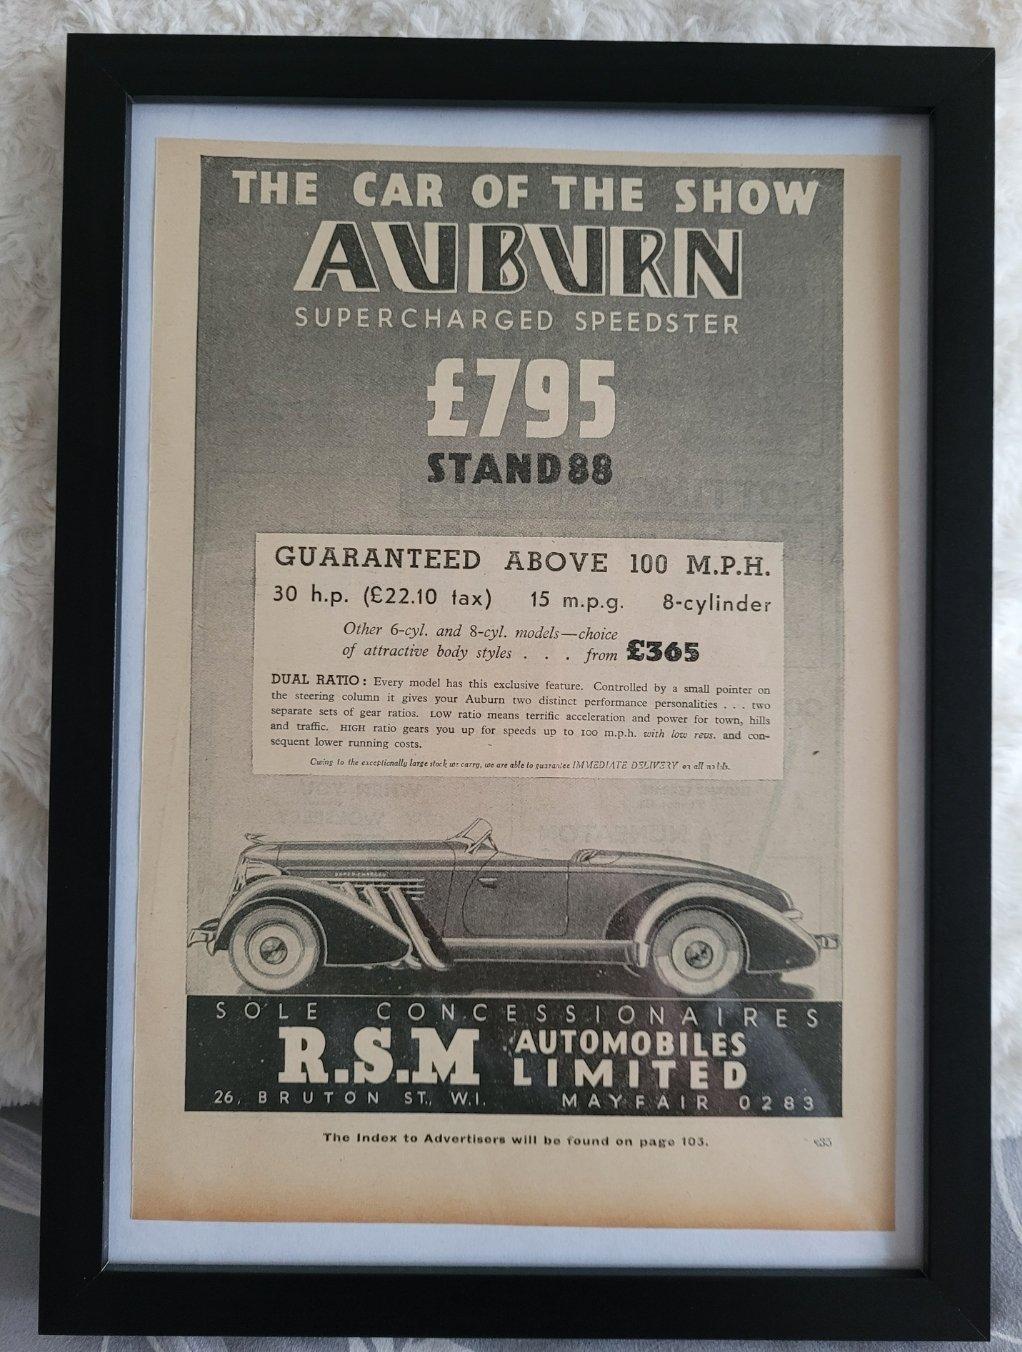 Original 1935 Auburn Framed Advert